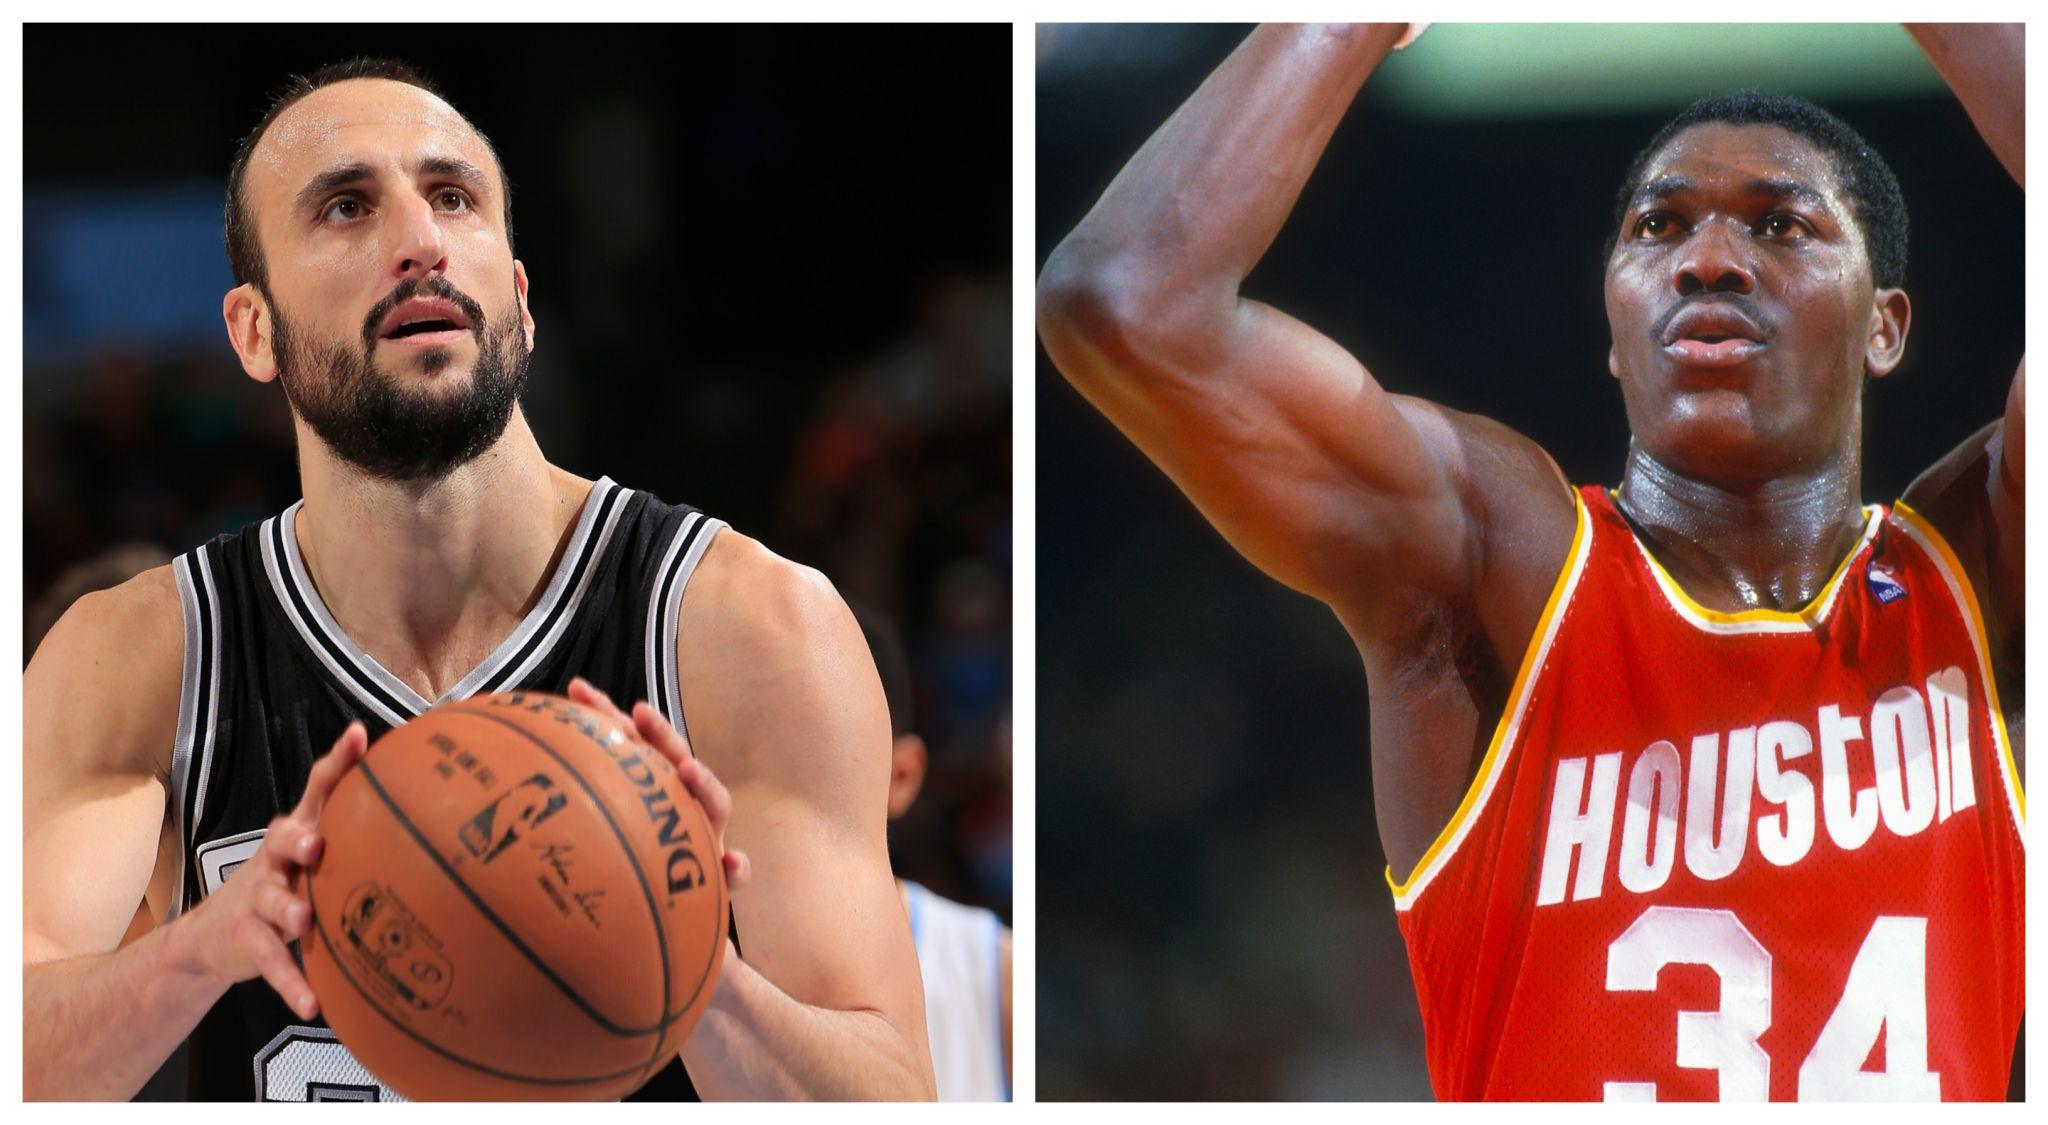 Spurs Basketball - Magazine cover